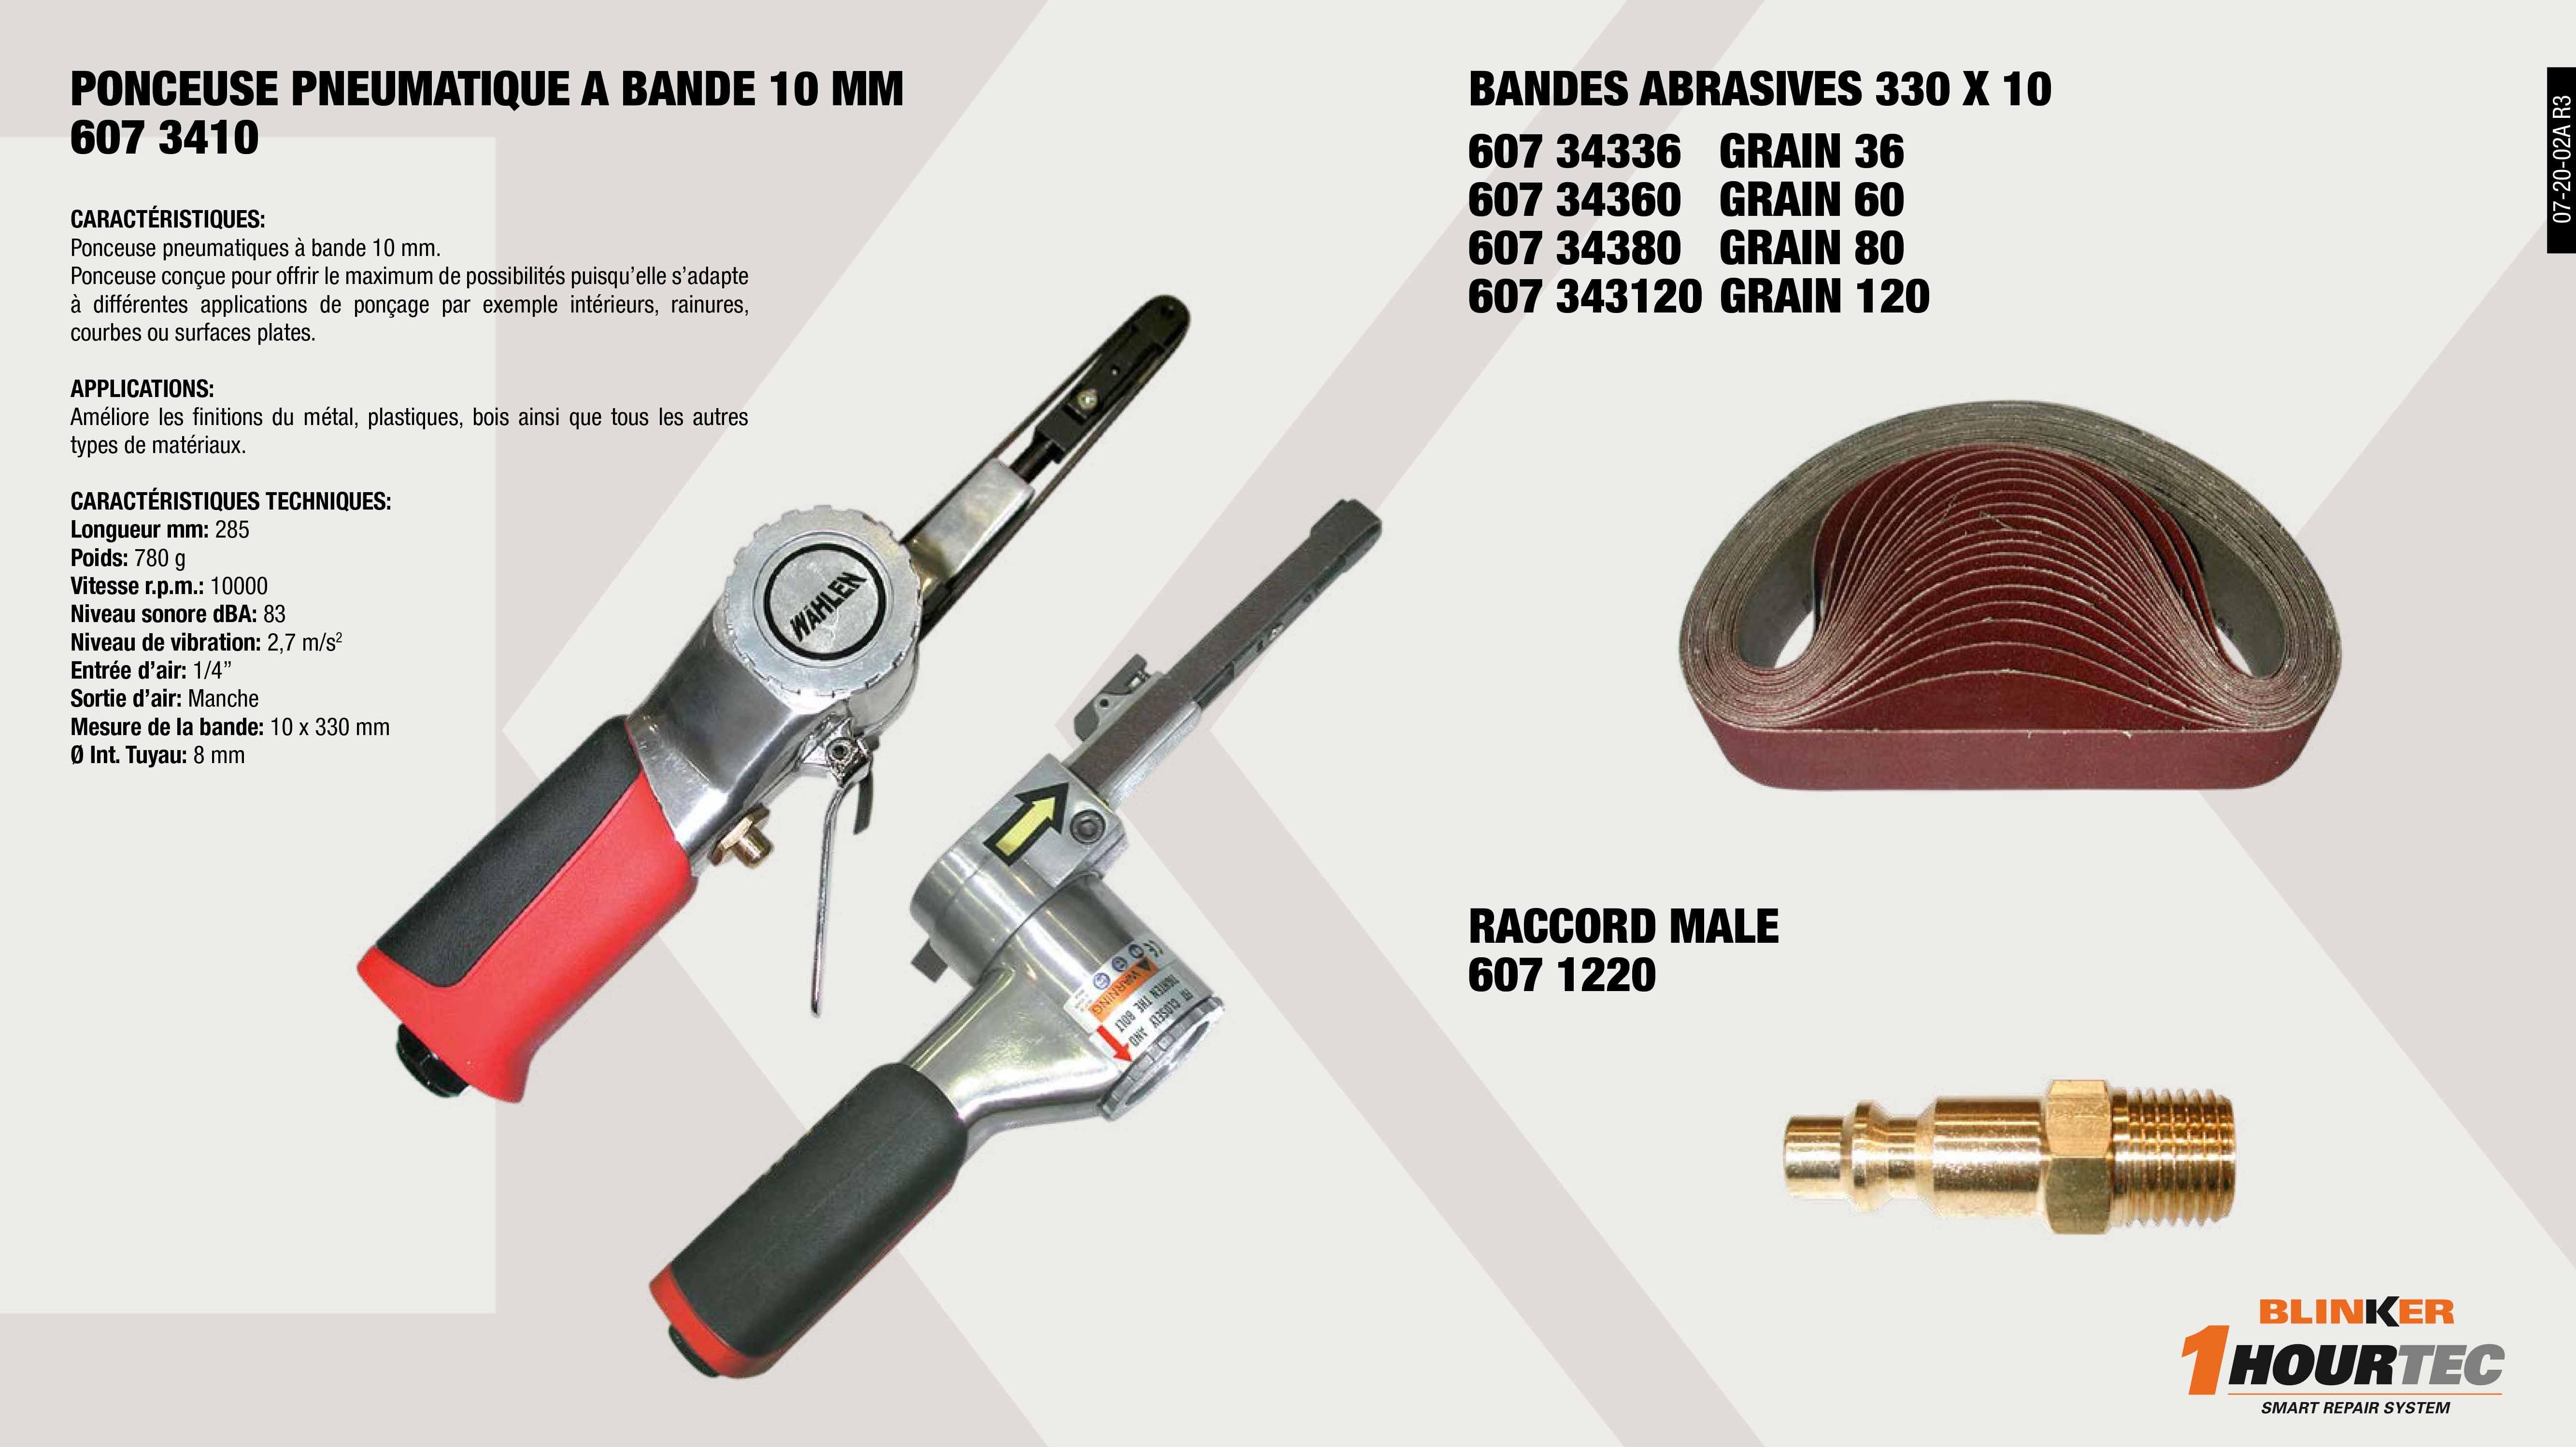 ADAPTATEUR ECROU MALE 1/4 883L/MN                           ,  PONCEUSE PNEUMATIQUE A BANDE 10MM                           ,  BANDE ABRASIVE 10X330 MM 60G                                ,  BANDE ABRASIVE 10X330 MM G36                                ,  BANDE ABRASIVE 10X330 MM 80G                                ,  BANDE ABRASIVE 10X330 MM G120                               ,